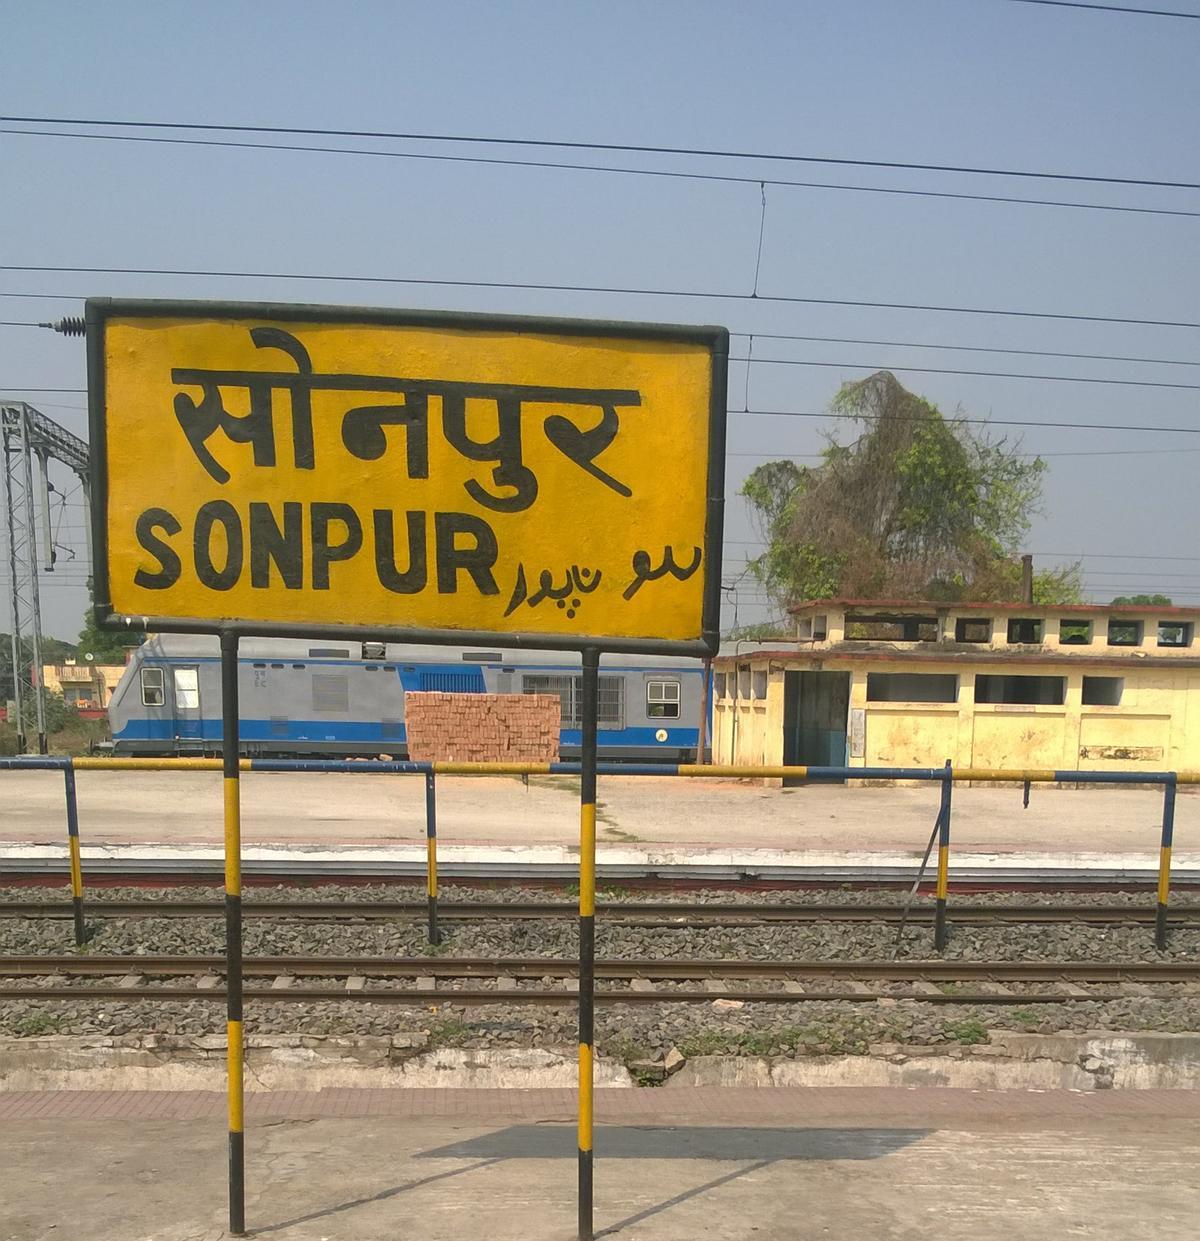 19166/Drbhng Ahmdbd SEE/Snpr #Railfanning at Sonpur 1&2-19166.